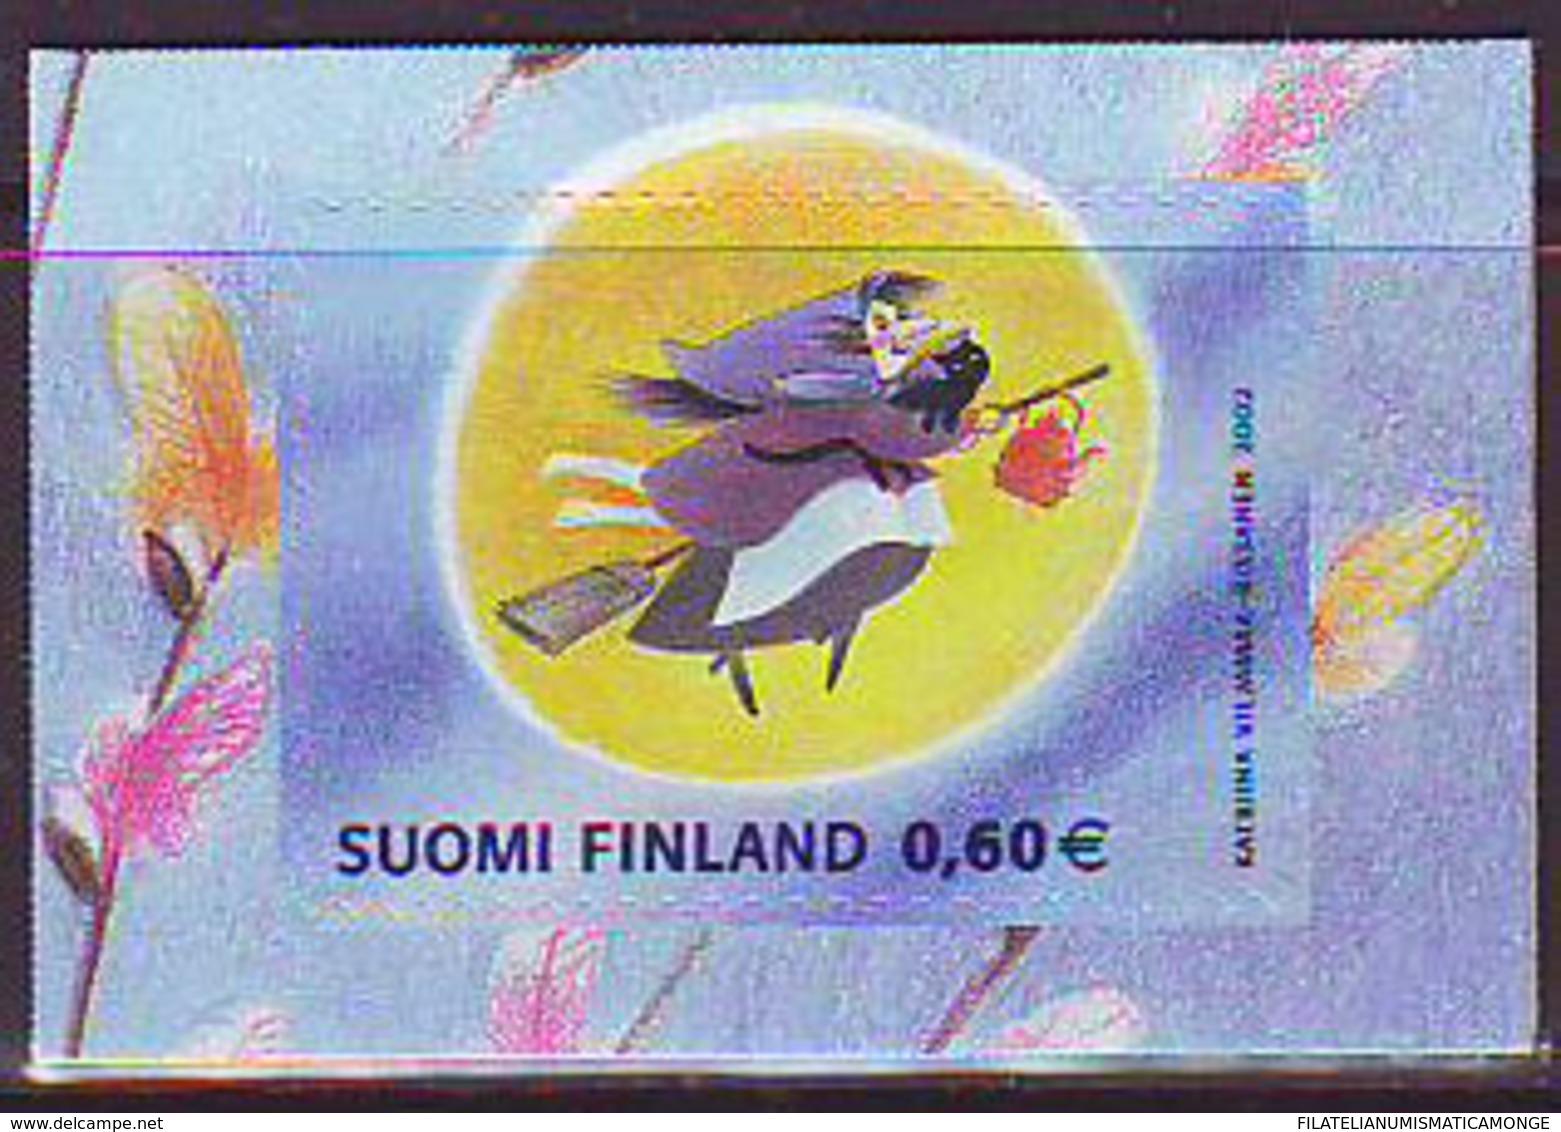 Finlandia 2002  Yvert Tellier  1575 Brujas  ** - Finland